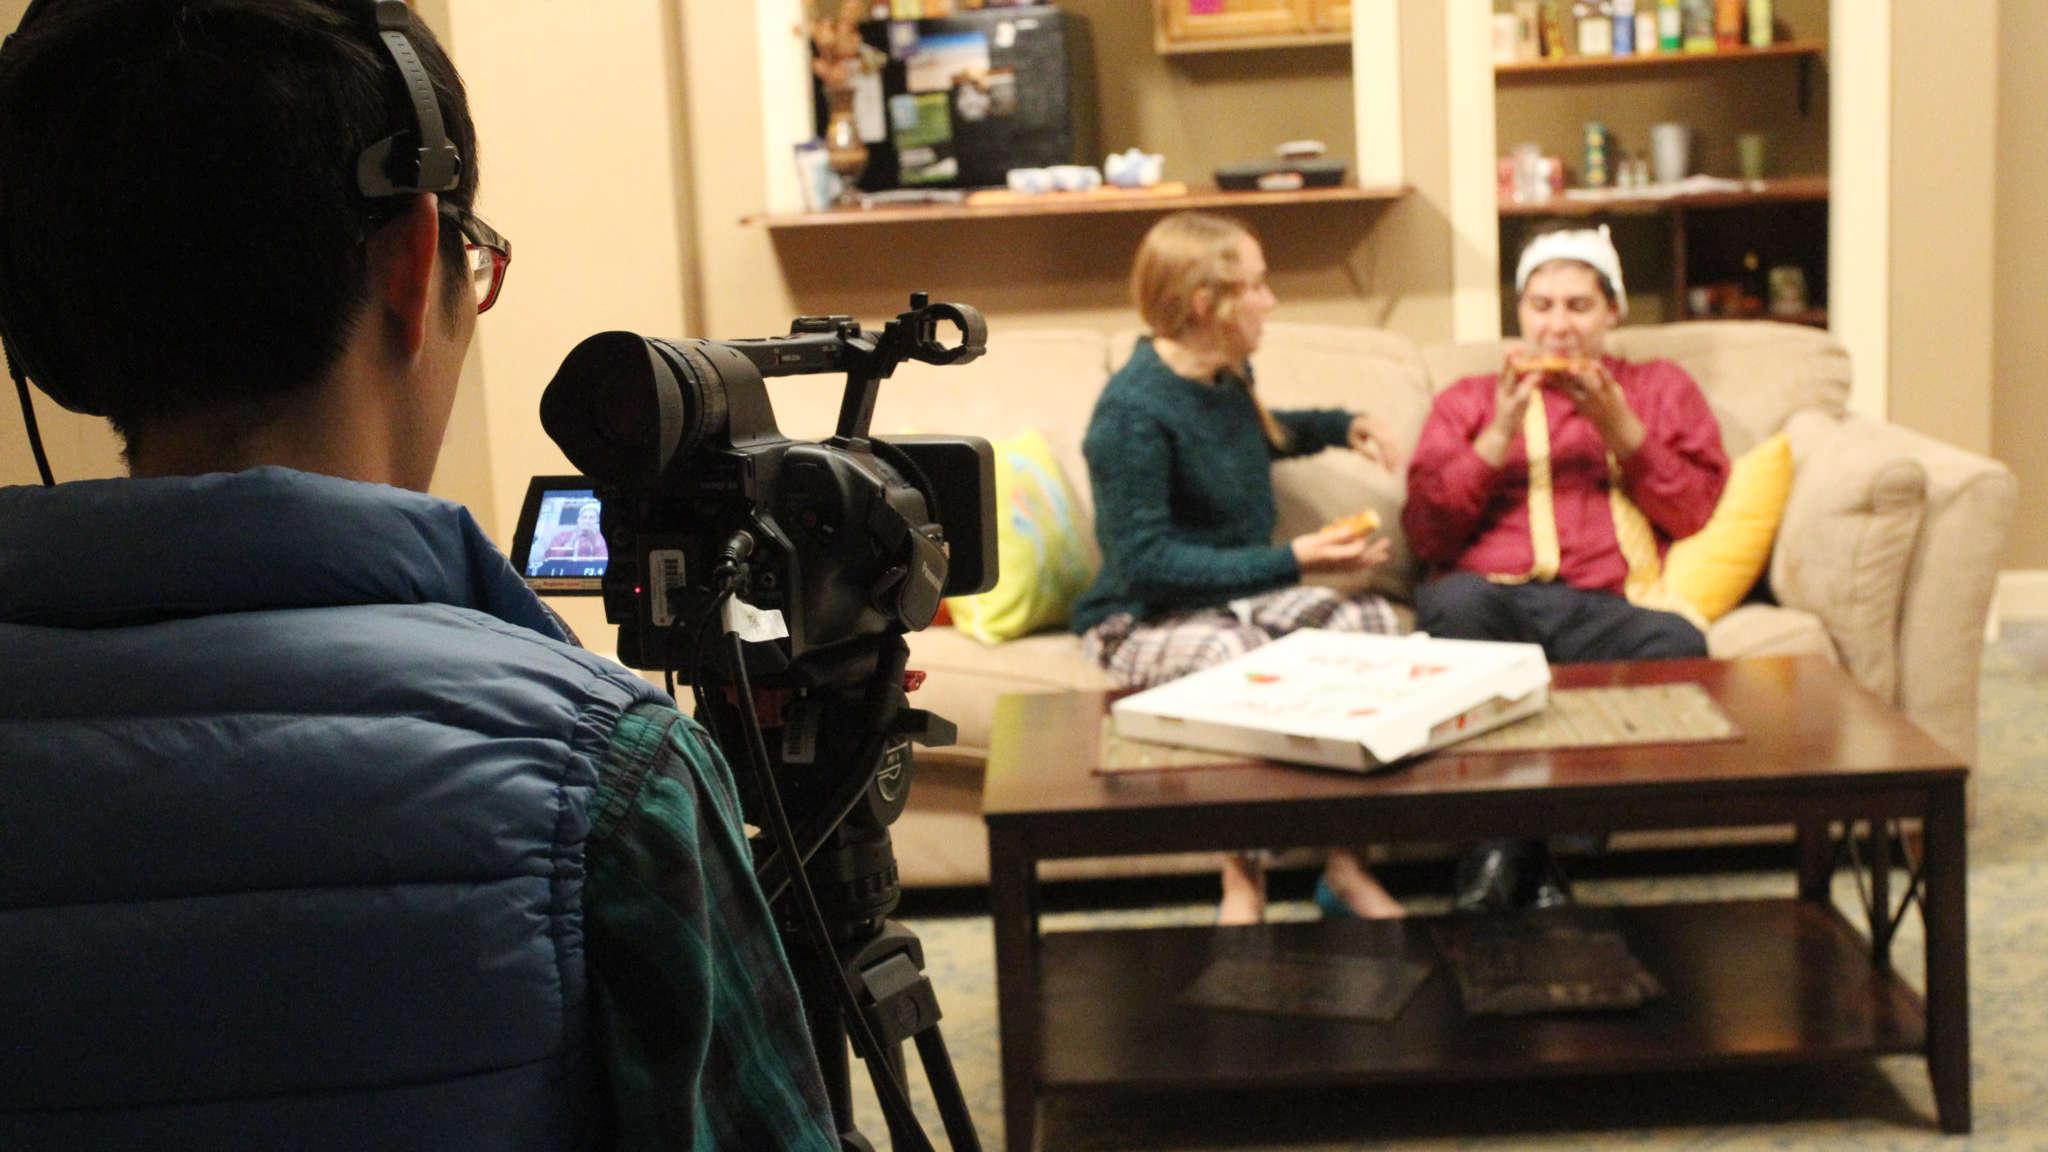 Filming actors on set